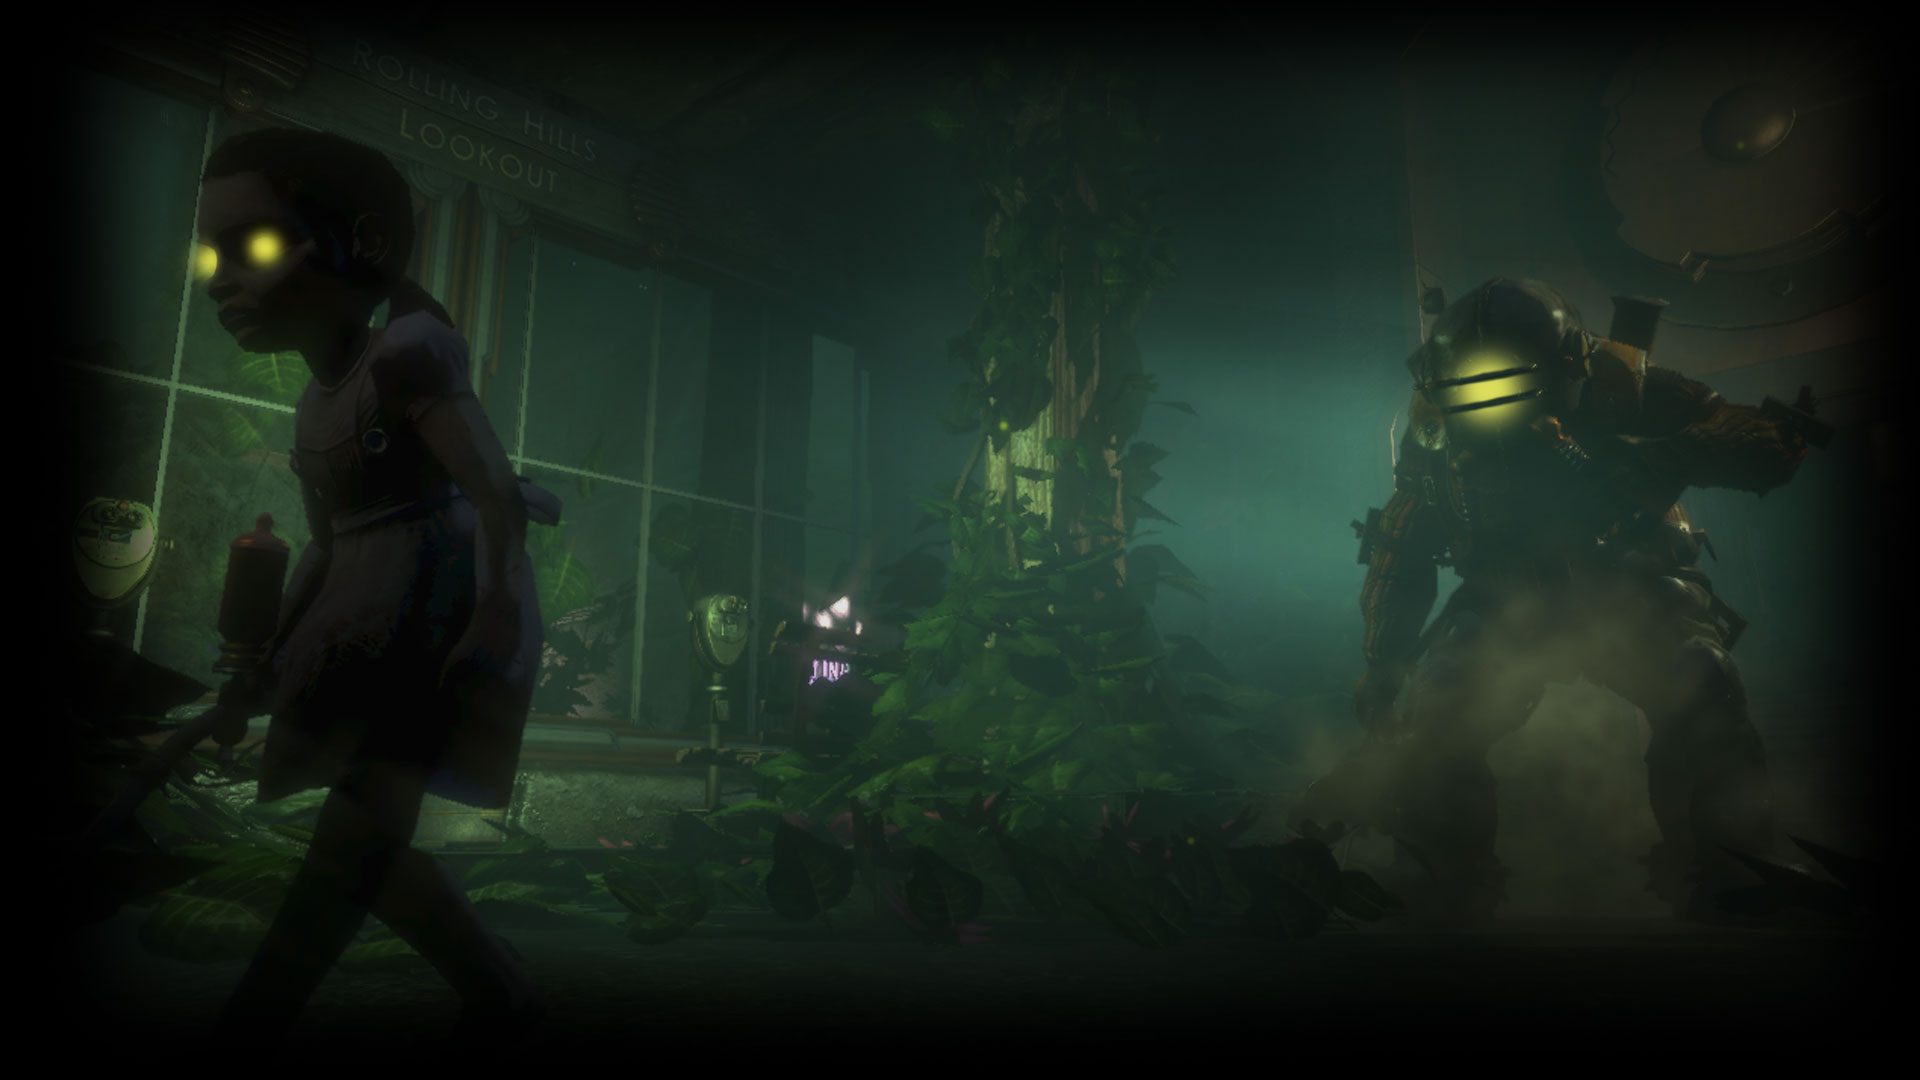 BioShock Remastered Background Big Daddy Follows Little Sister